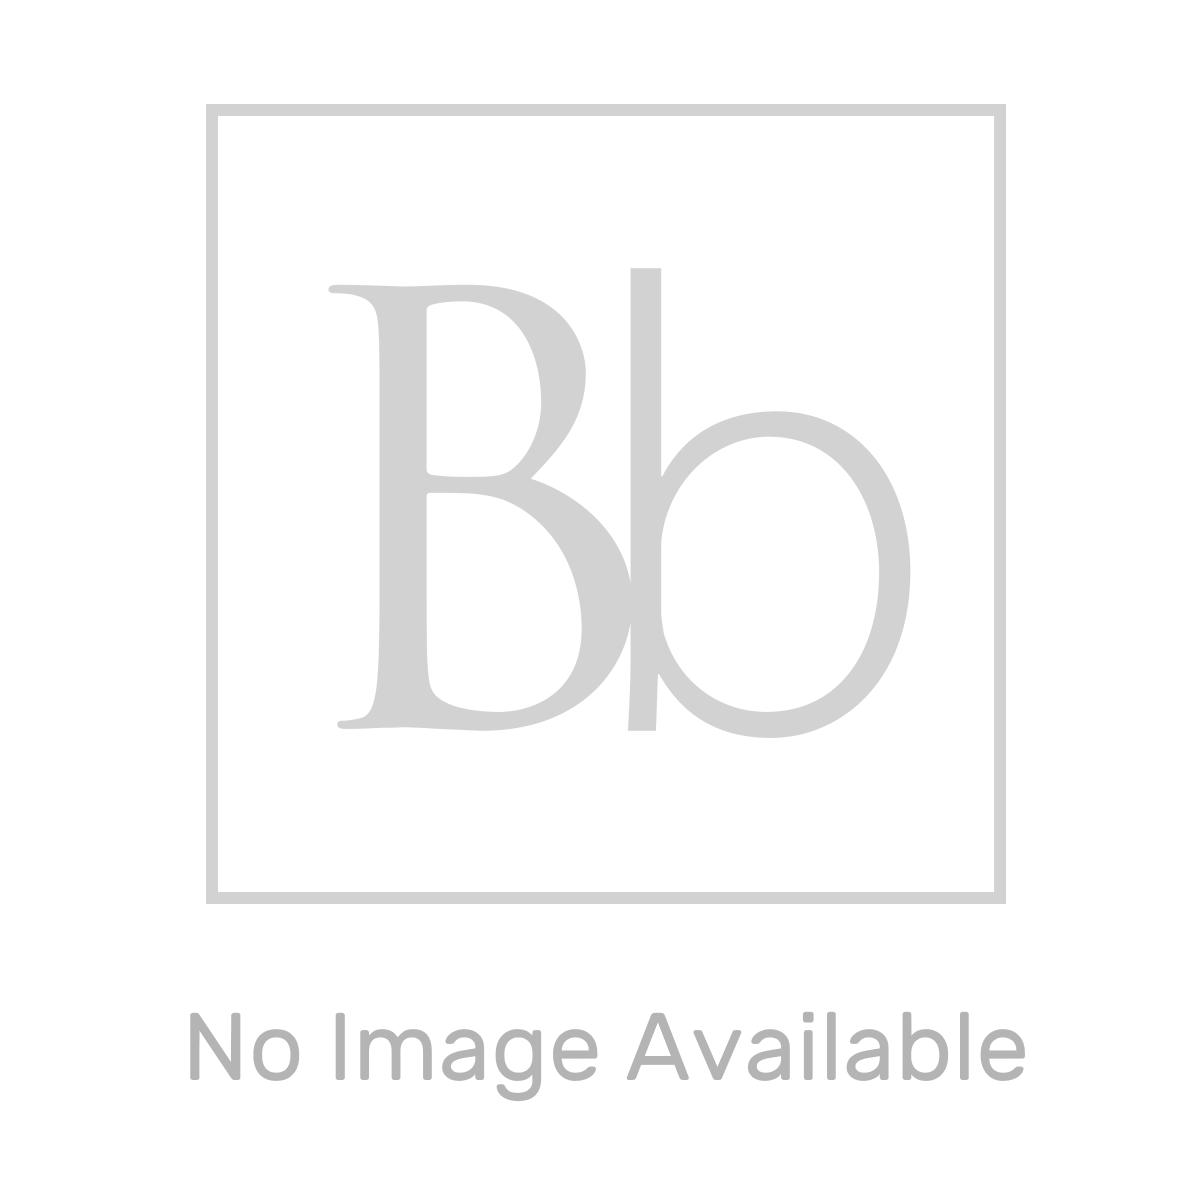 HiB Hush Wall Mounted Chrome Wetroom Extractor Fan with Humidity Sensor